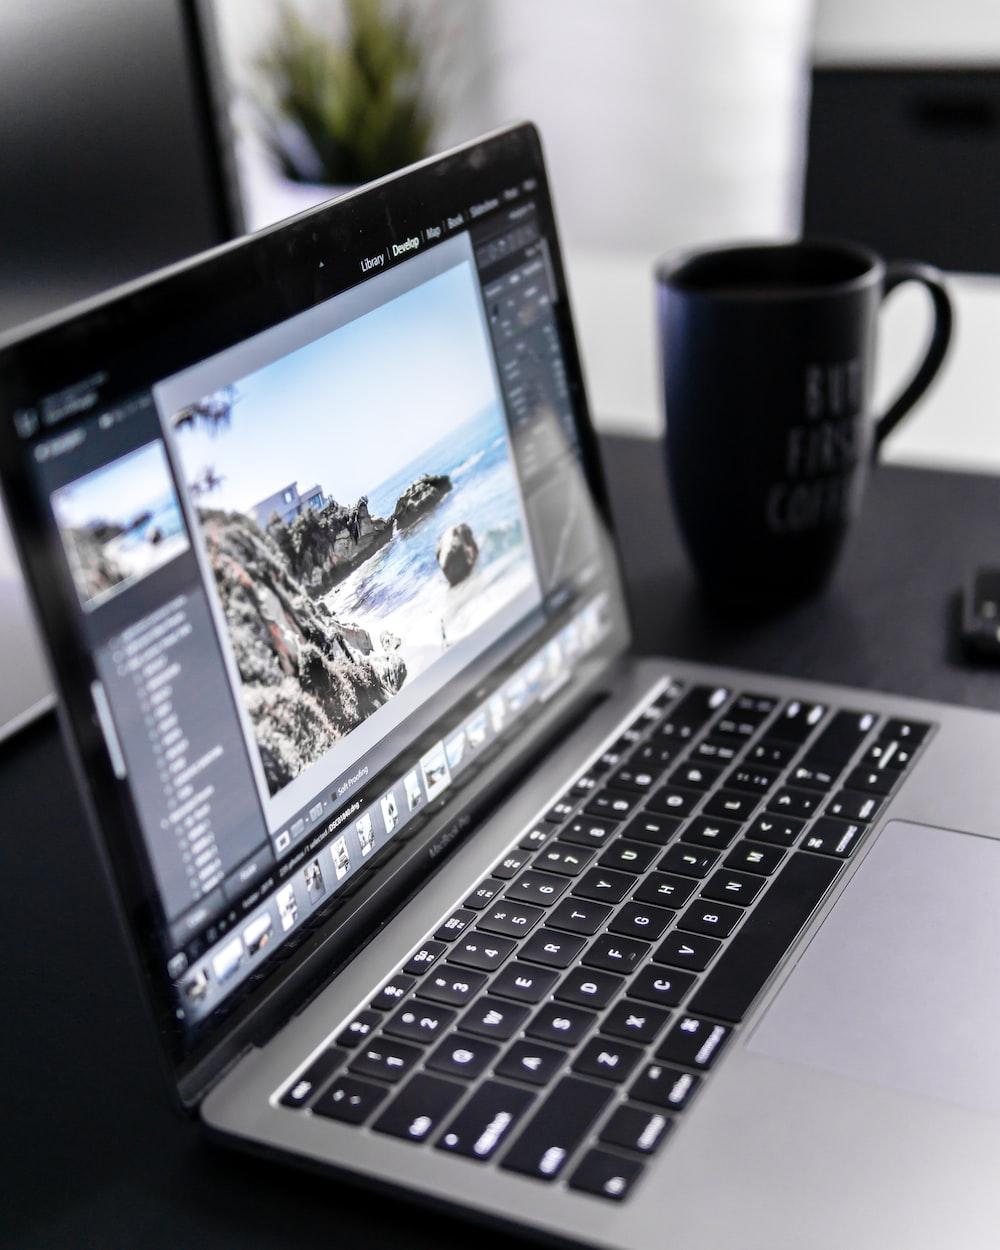 turned-on MacBook Pro on desk